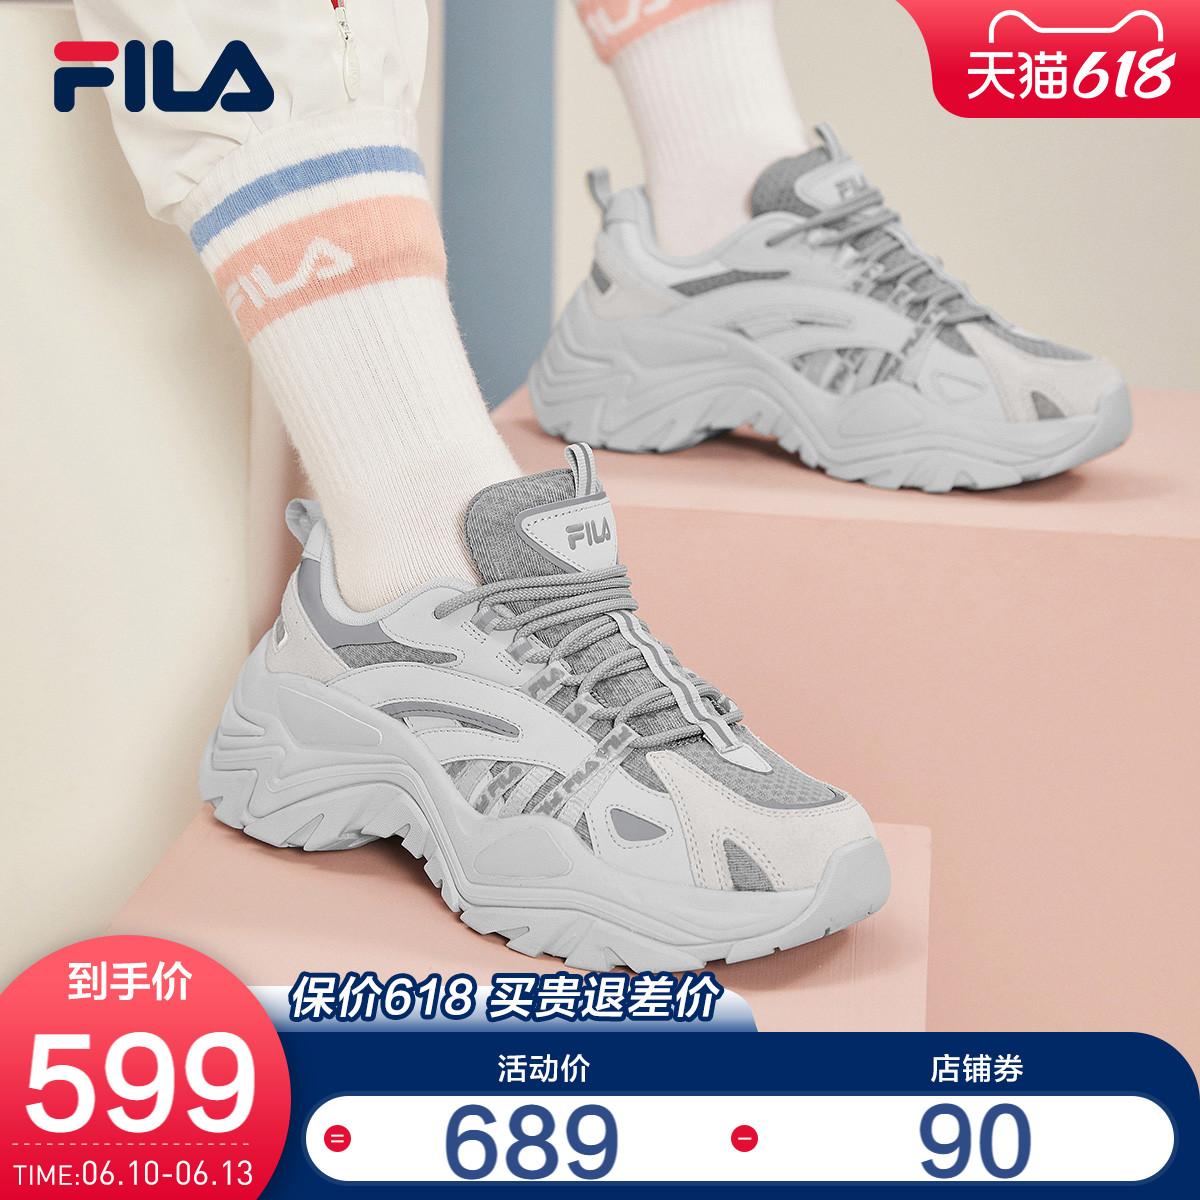 FILA 斐乐鱼刺 时尚休闲老爹鞋女2021夏季新款休闲鞋运动鞋女鞋